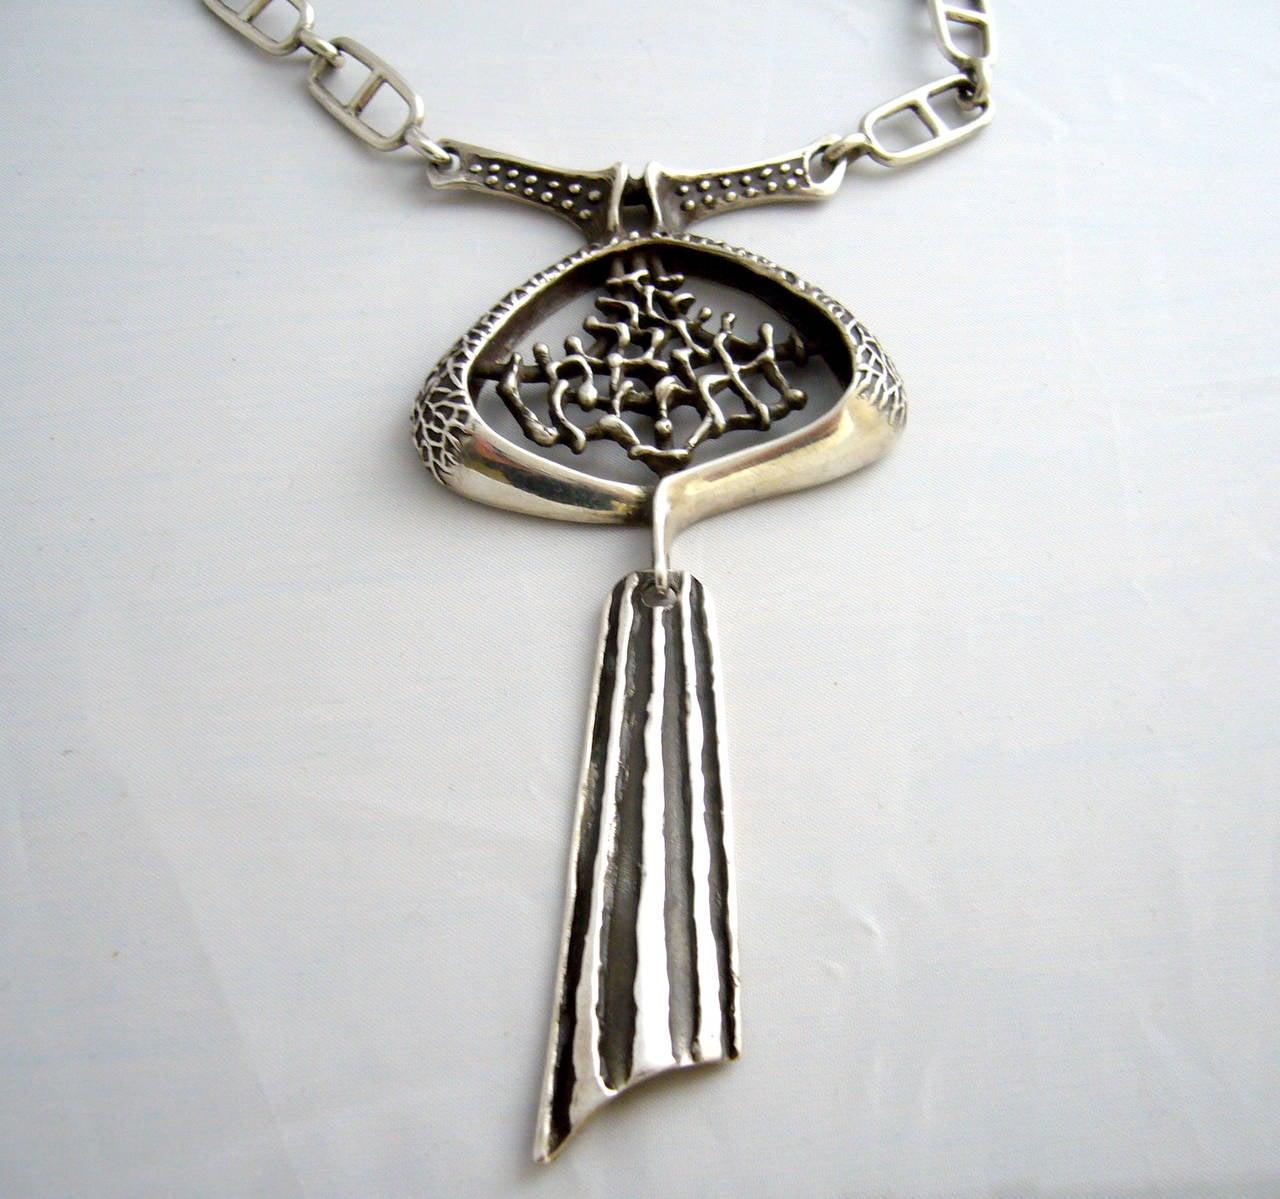 1970s Brutalist Sterling Silver Necklace at 1stdibs